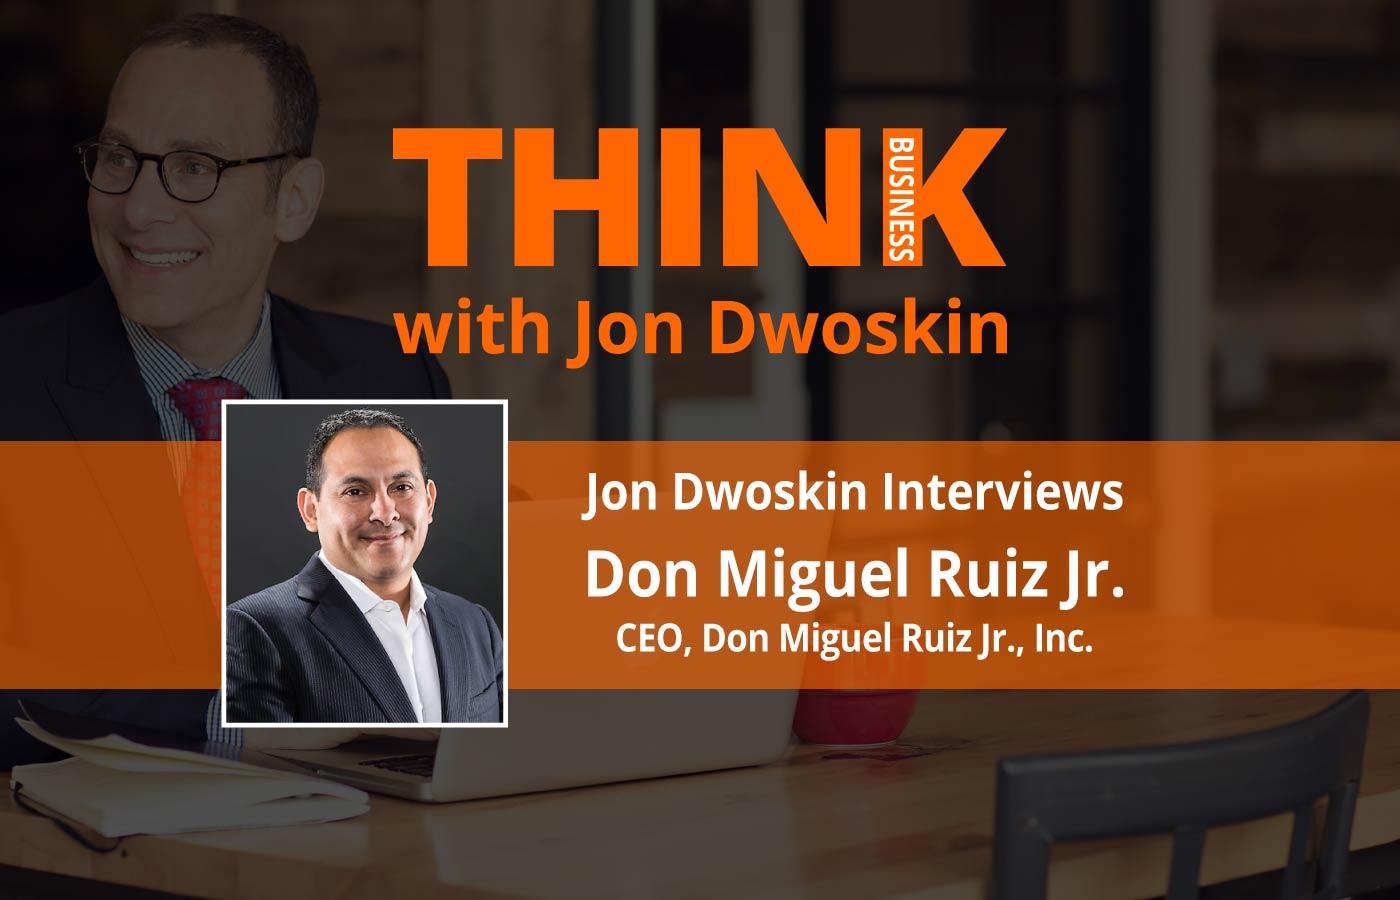 THINK Business Podcast: Jon Dwoskin Interviews Don Miguel Ruiz Jr, CEO, Don Miguel Ruiz Jr., Inc